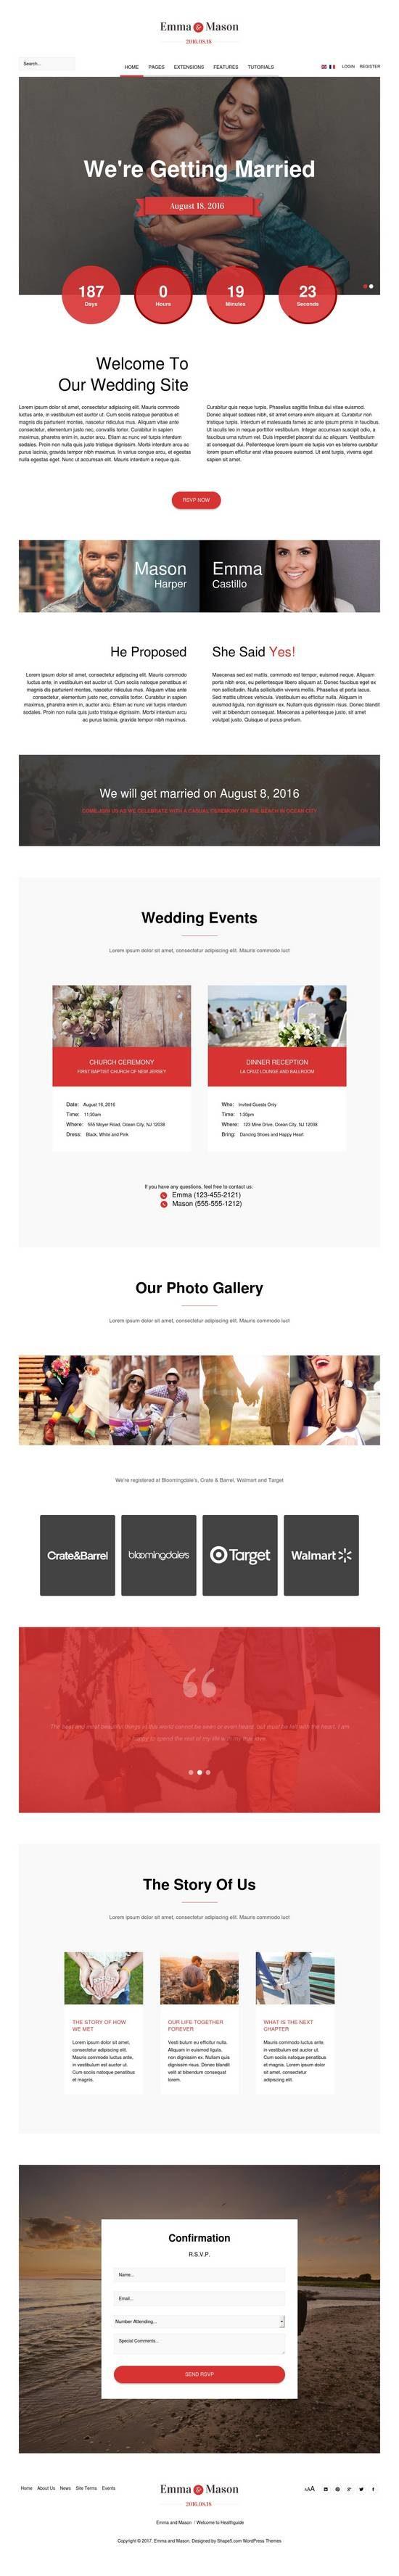 emma and mason wedding shape5 wordpress theme 01 550x3552 - Emma and Mason Wedding WordPress Theme